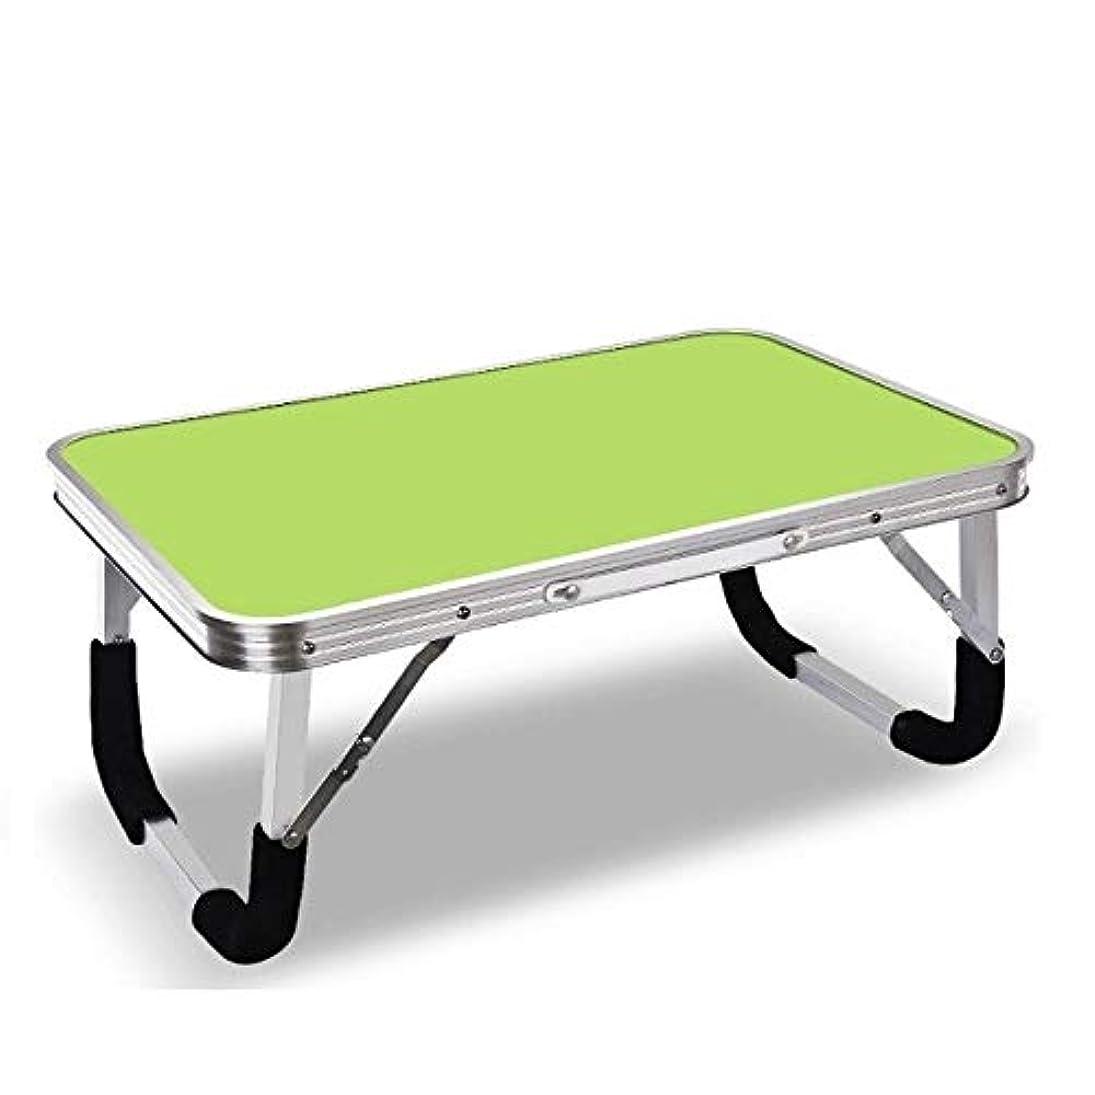 Yalztc-zyq16 シンプルなテーブル小さなテーブルスタックコンピュータデスクベッドデスクスタッカブルコンピュータデスクベッド (Color : Green)